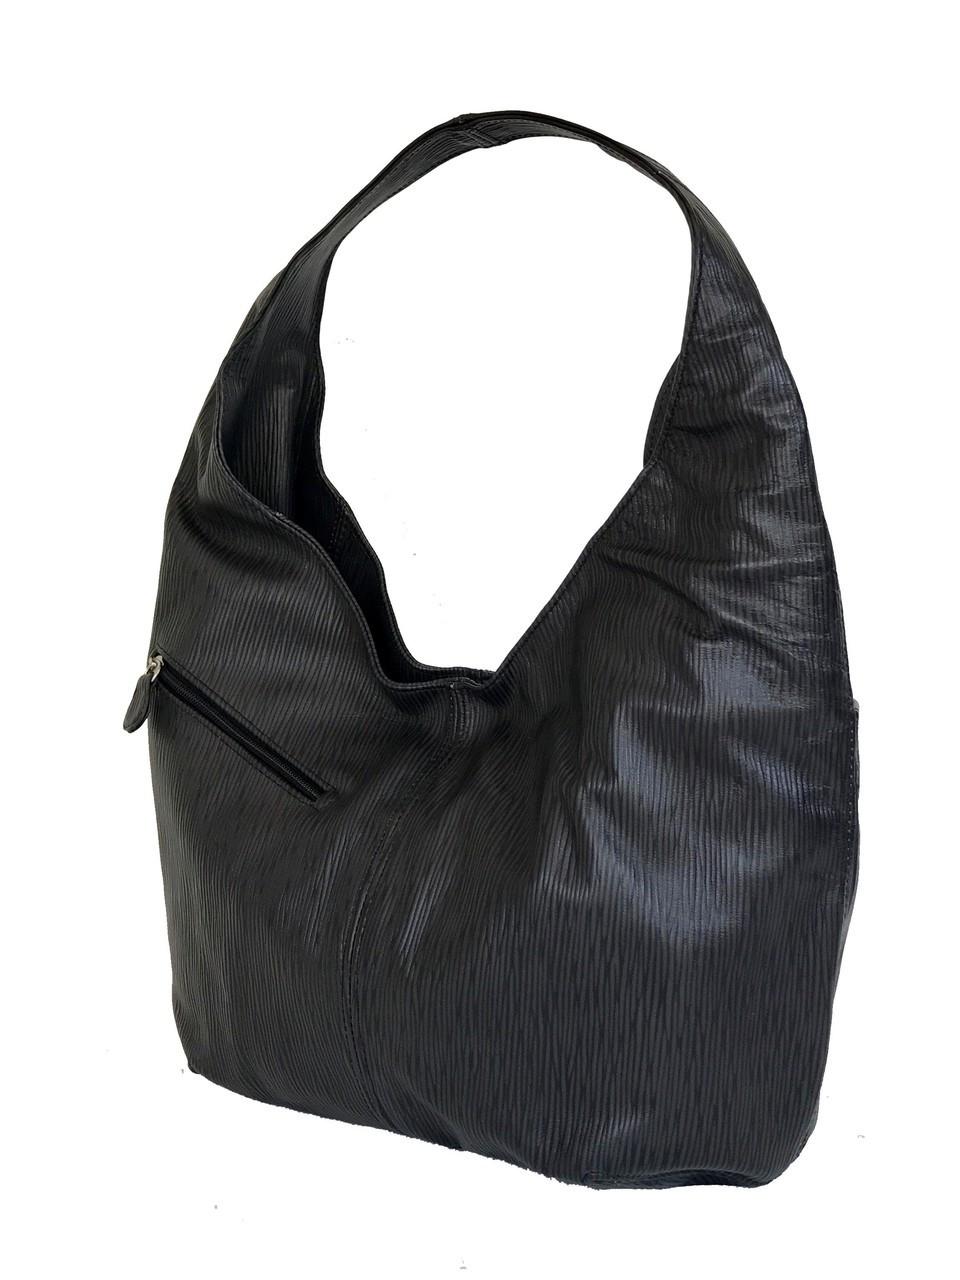 001683069dc3 Black Leather Hobo Bag w  Pockets